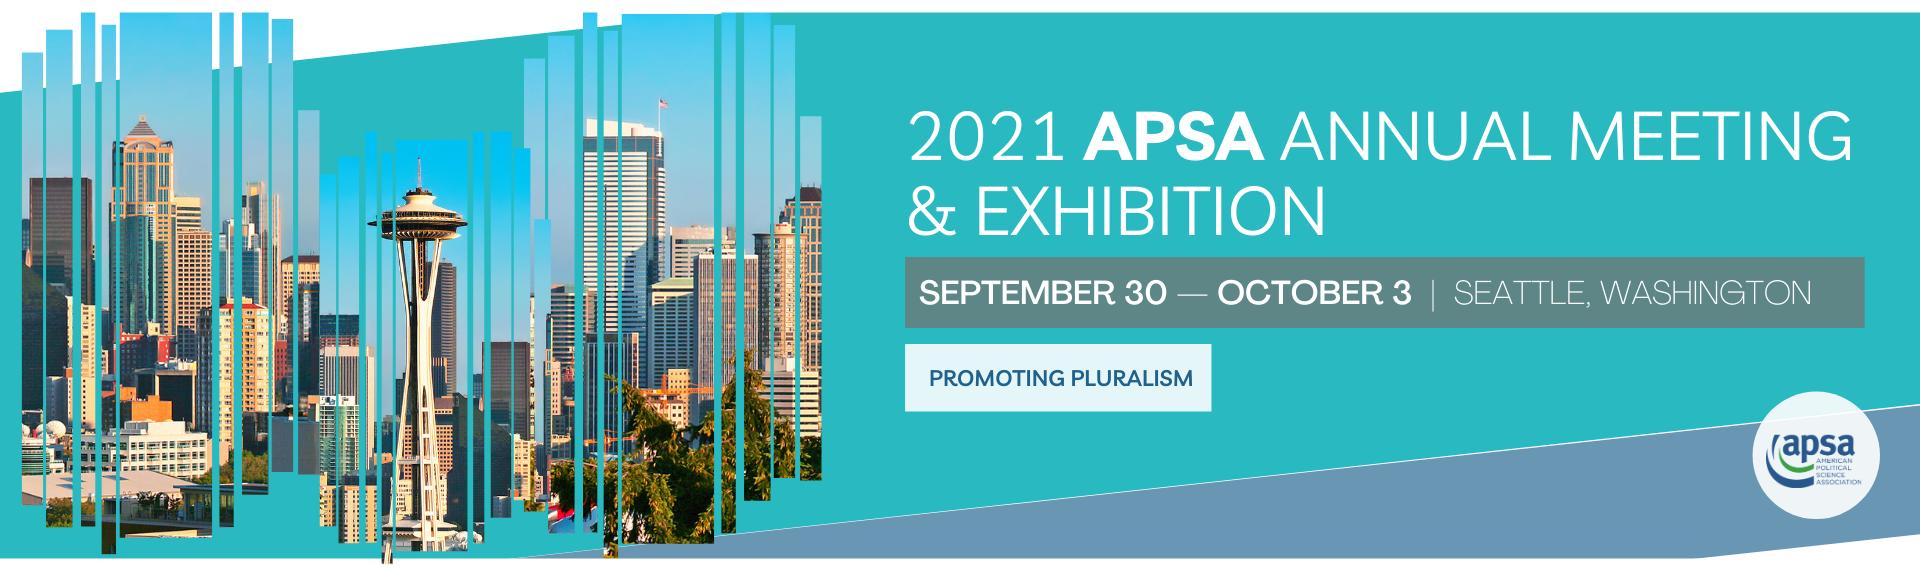 2021 APSA Annual Meeting